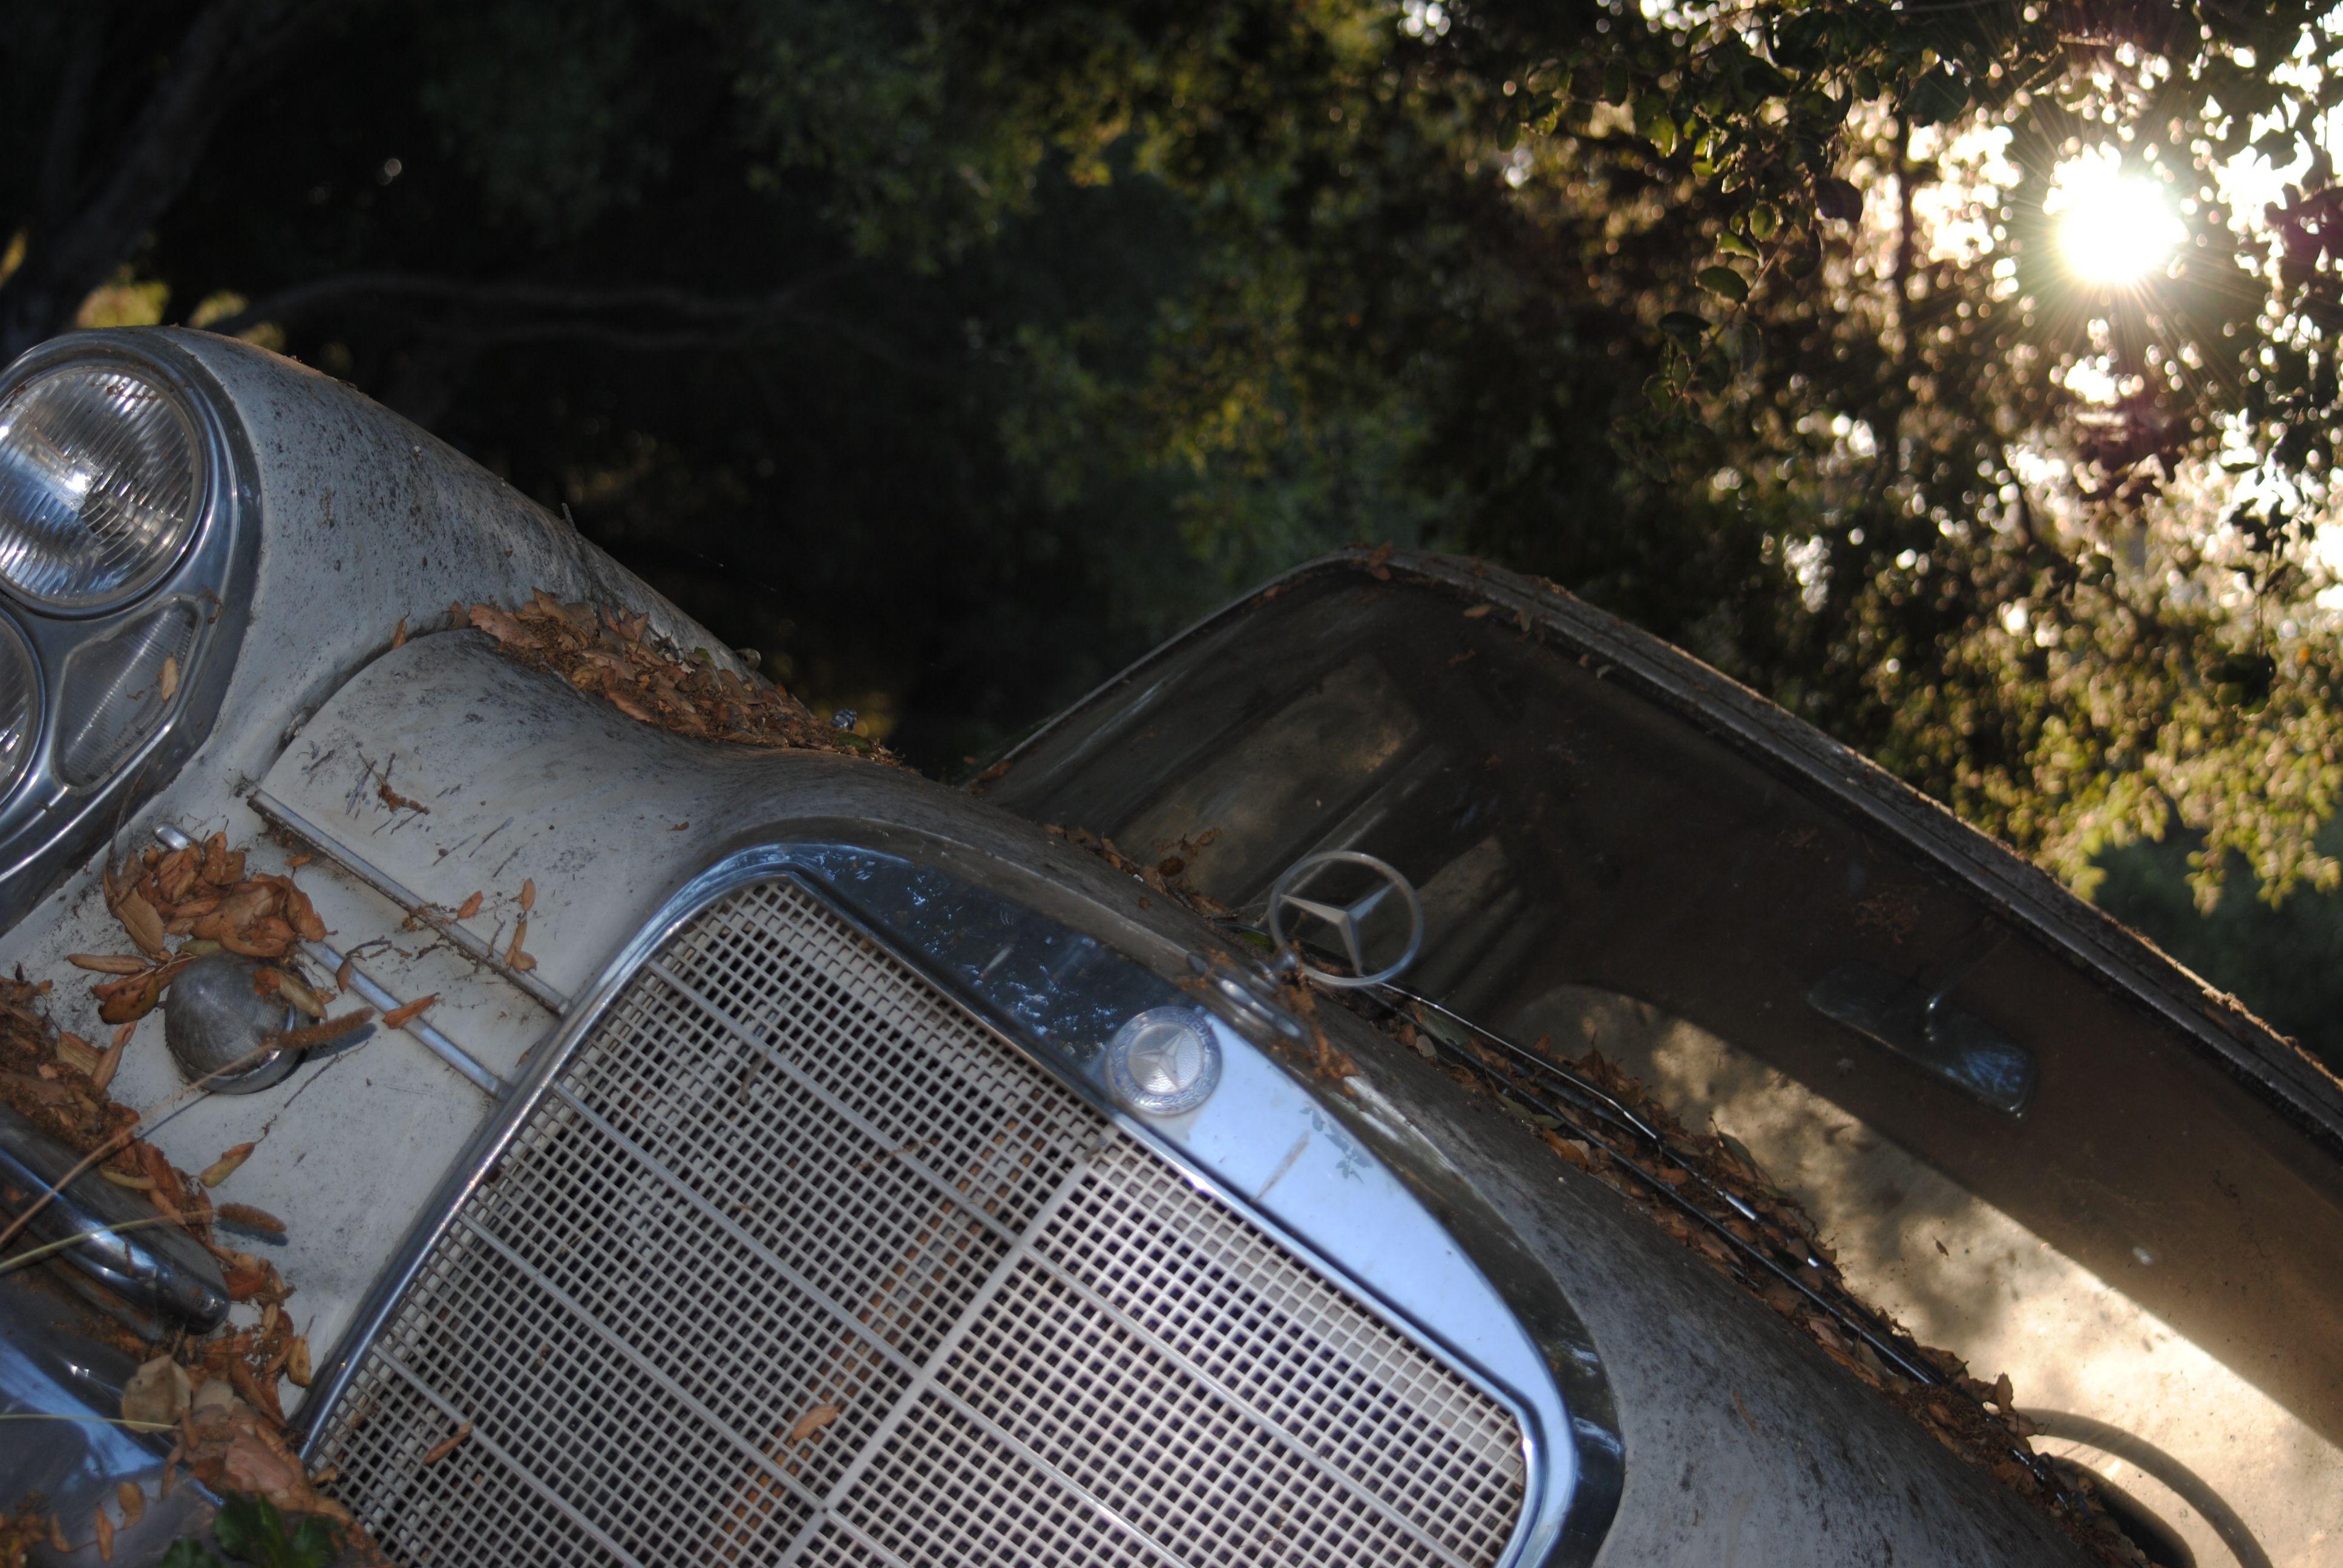 1964 MercedesBenz 220SE Mercedes benz